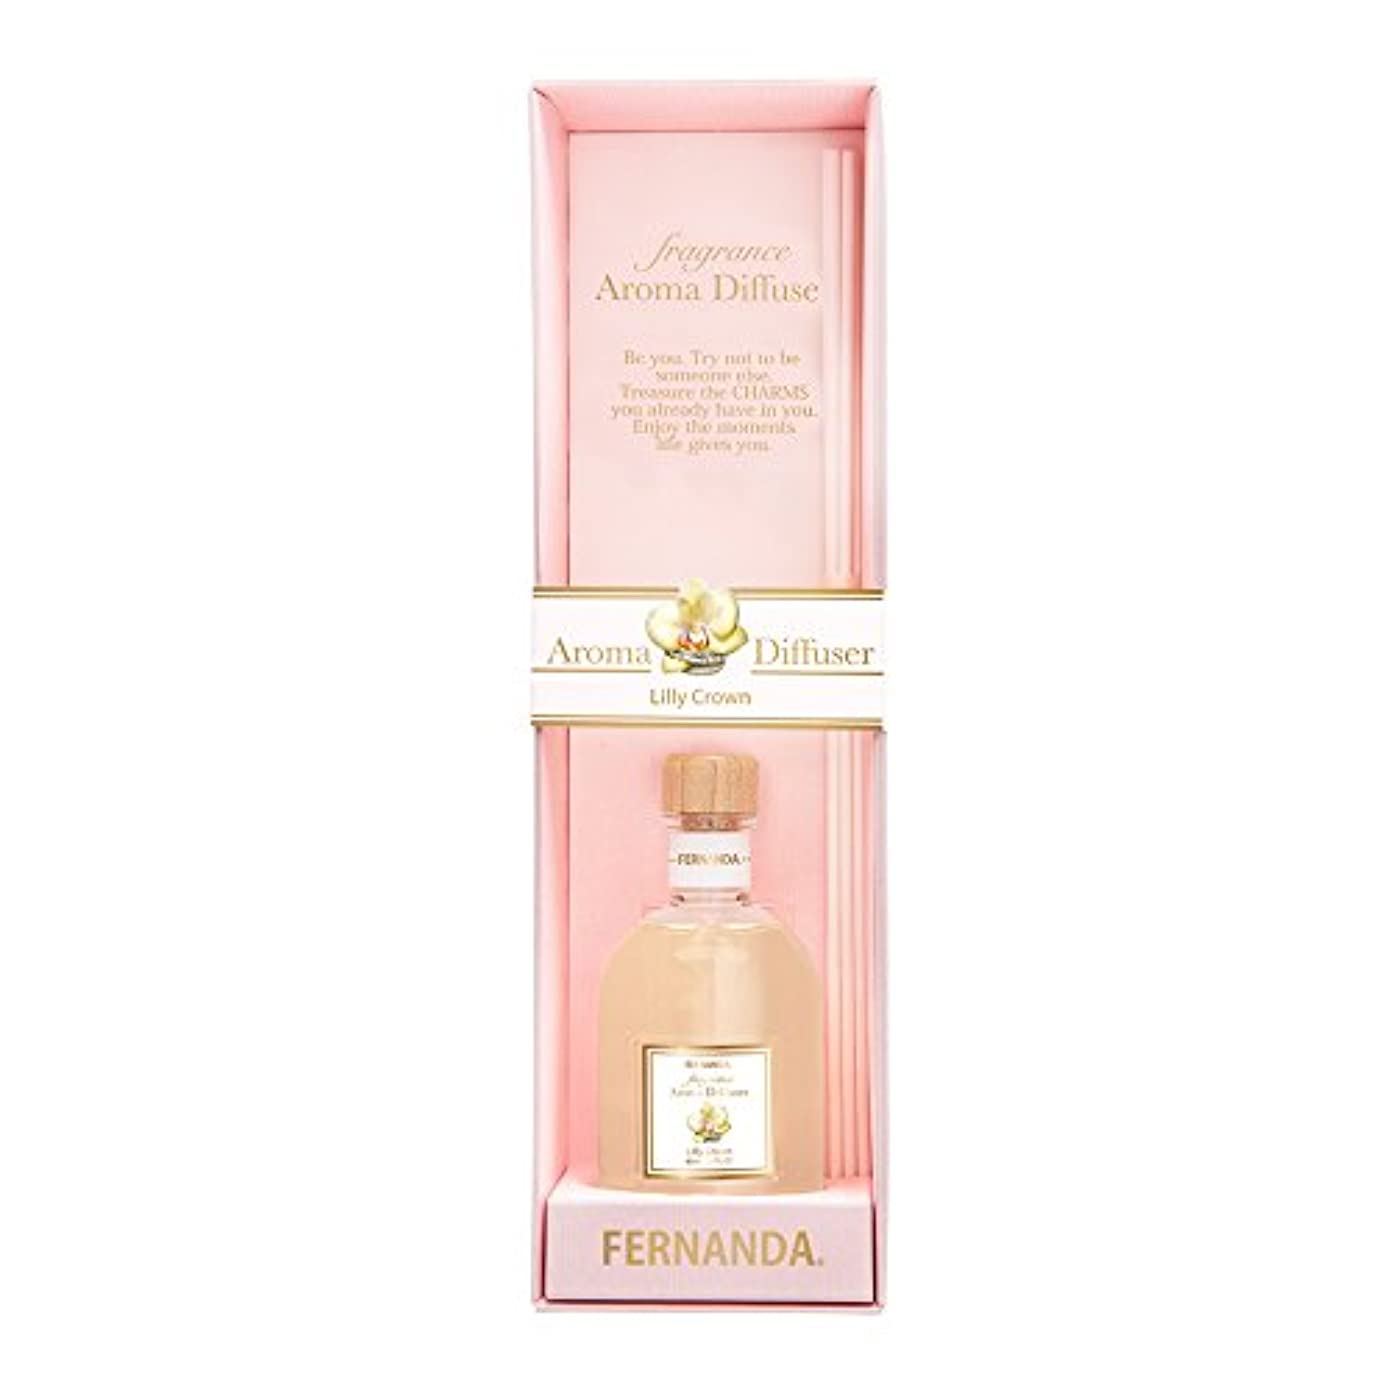 FERNANDA(フェルナンダ) Fragrance Aroma Diffuser Lilly Crown (アロマディフューザー リリークラウン)